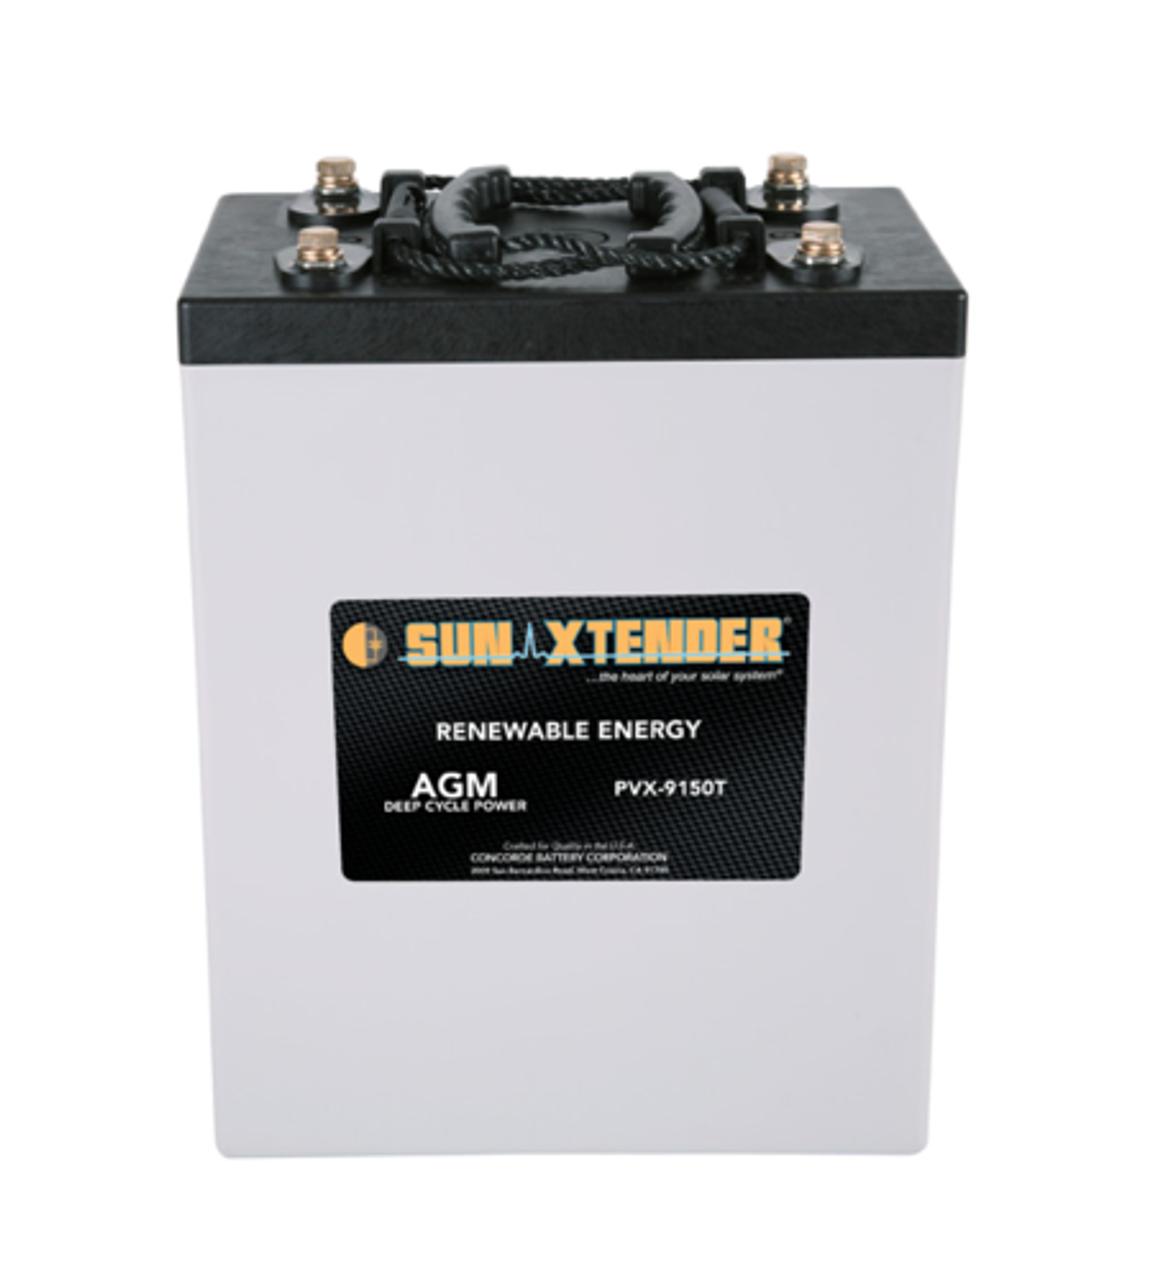 Concorde Sun Xtender PVX-9150T 2V, 915AH AGM Battery